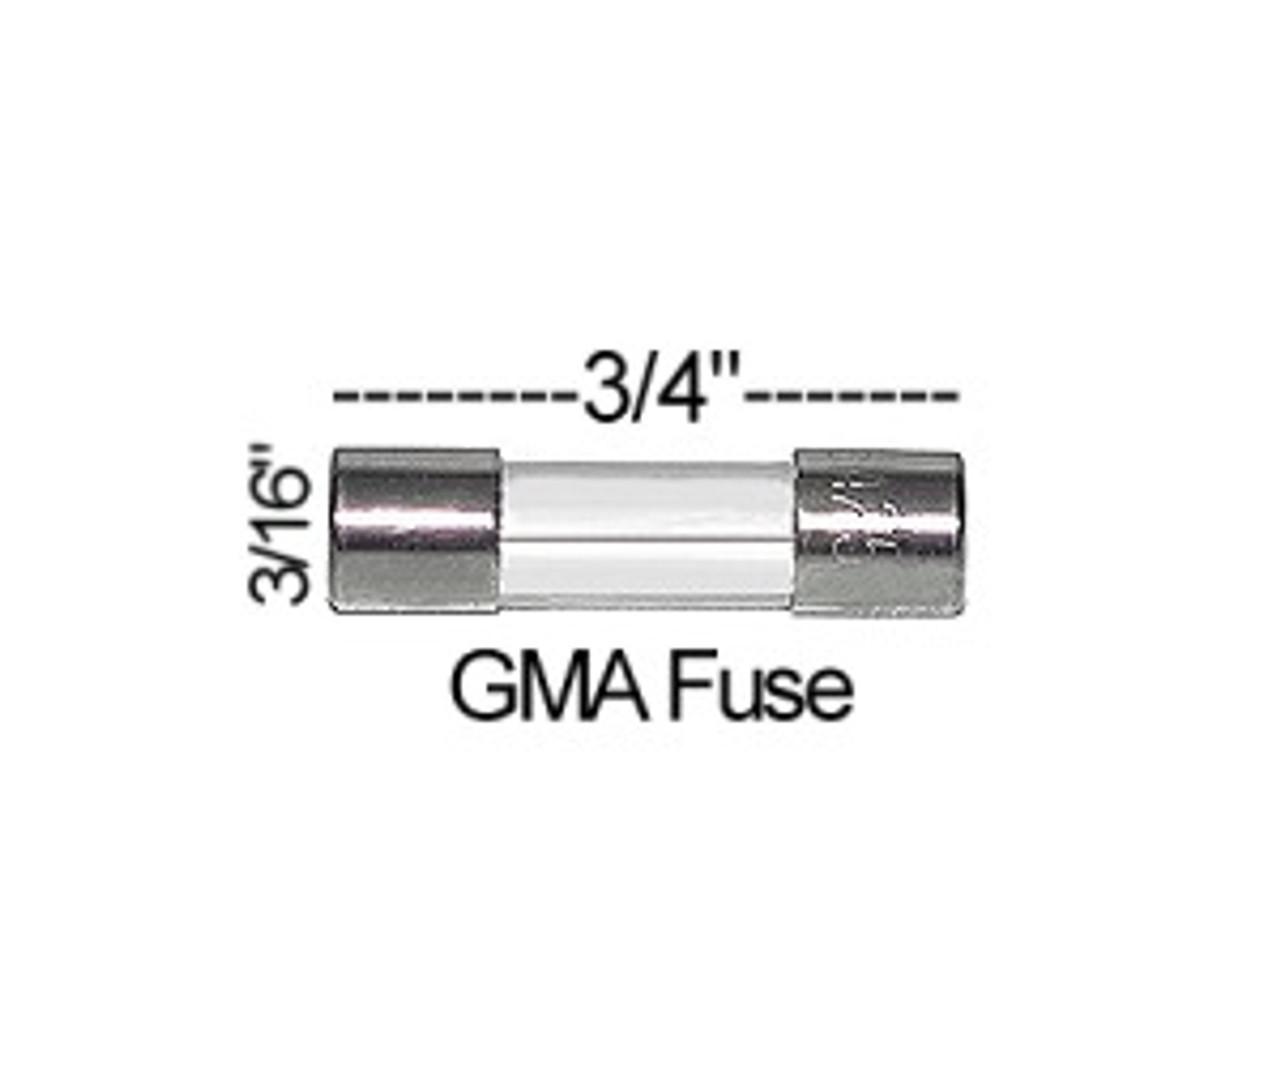 GMA Type Fuse